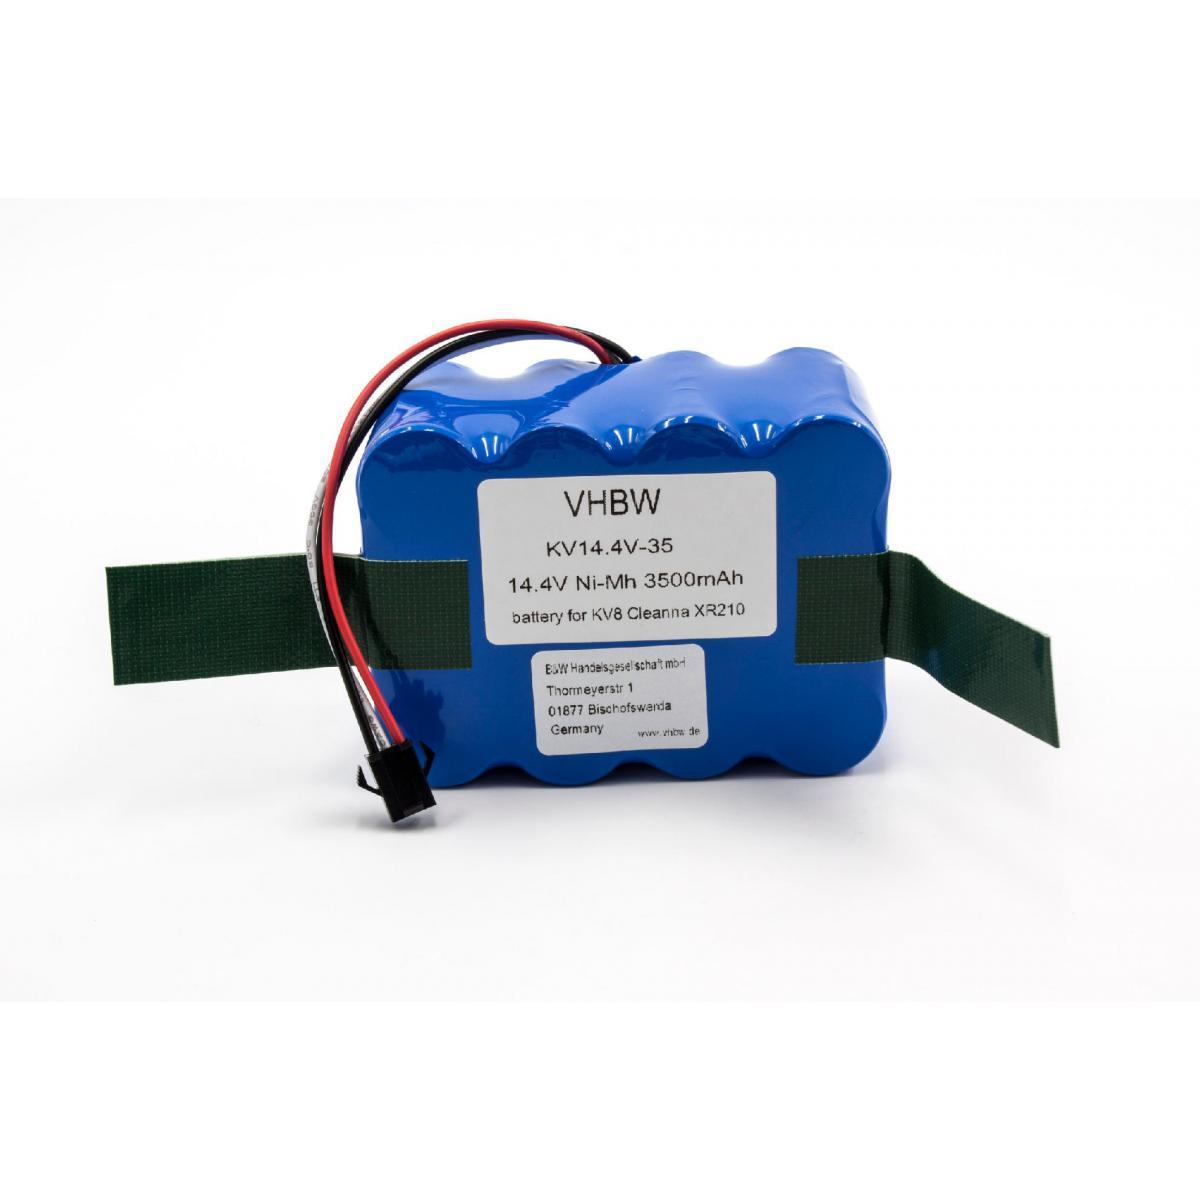 Vhbw vhbw NiMH batterie 3500mAh (14.4V) pour robot aspirateur Home Cleaner robots domestiques Nestor E.Ziclean Furtiv